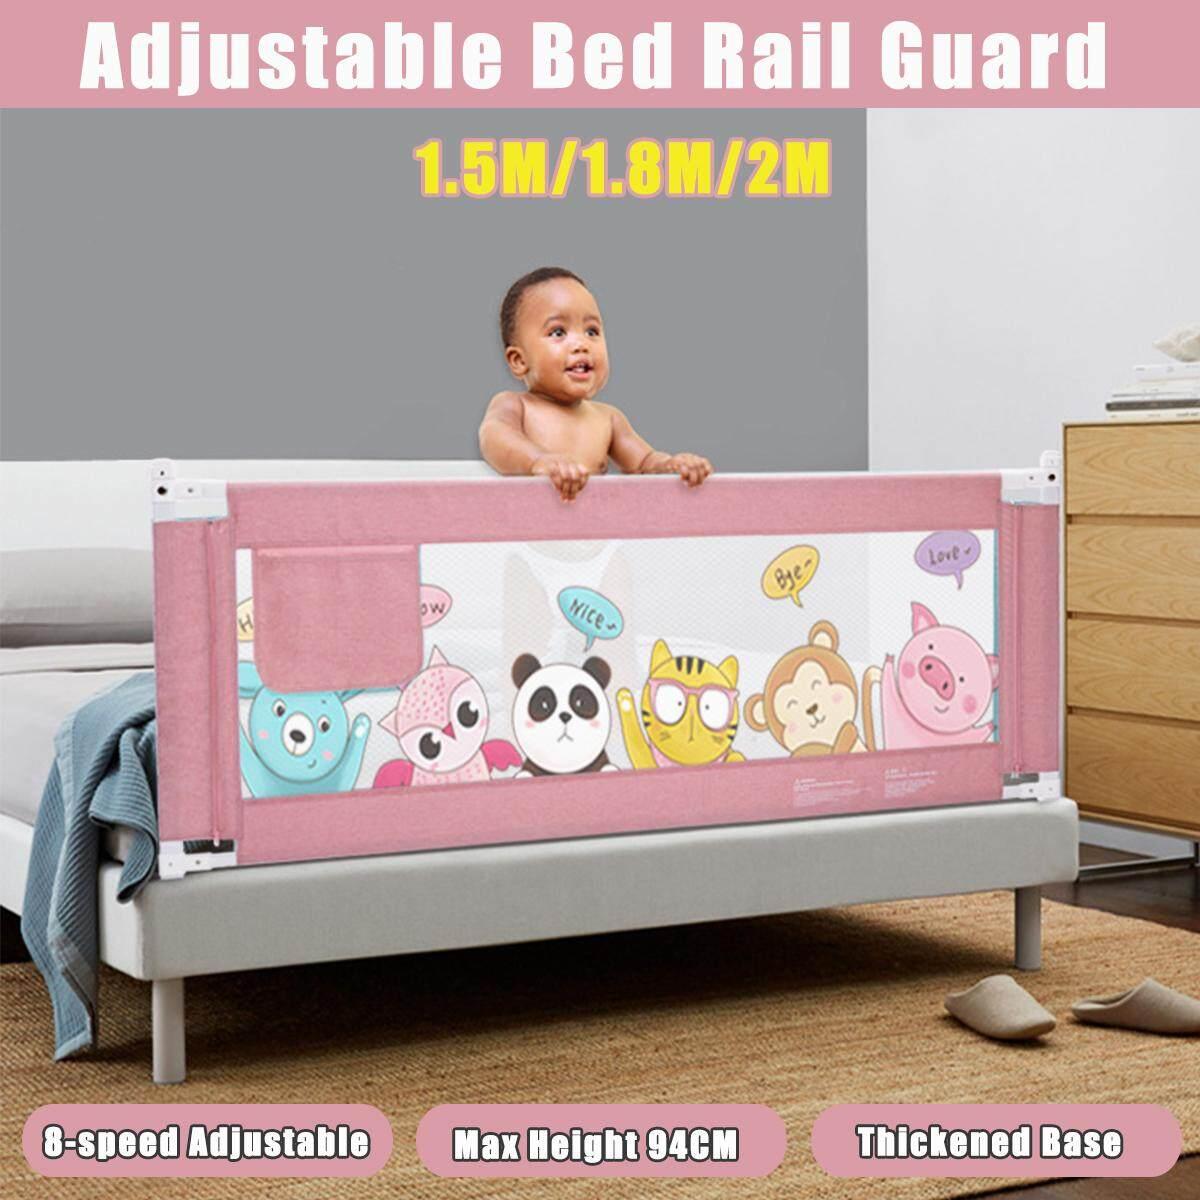 Giá Sốc Duy Nhất Hôm Nay Khi Mua 1.5M /1.8M /2M Pink Kids Sleeping Safety Bed Rail Guard Child Bedguard Toddler